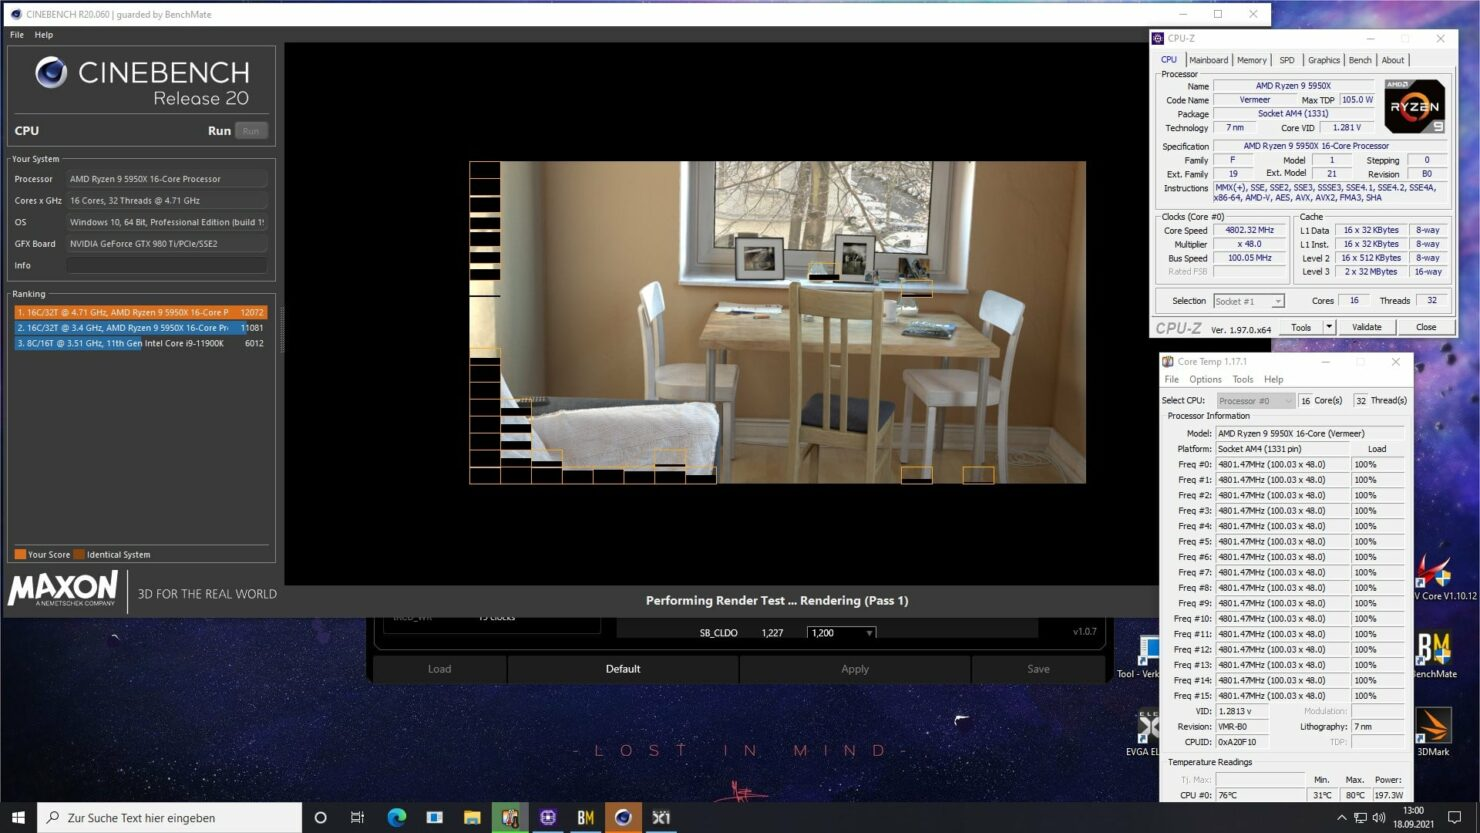 evga-x570-dark-motherboard-_amd-ryzen-9-5950x-4-8-ghz